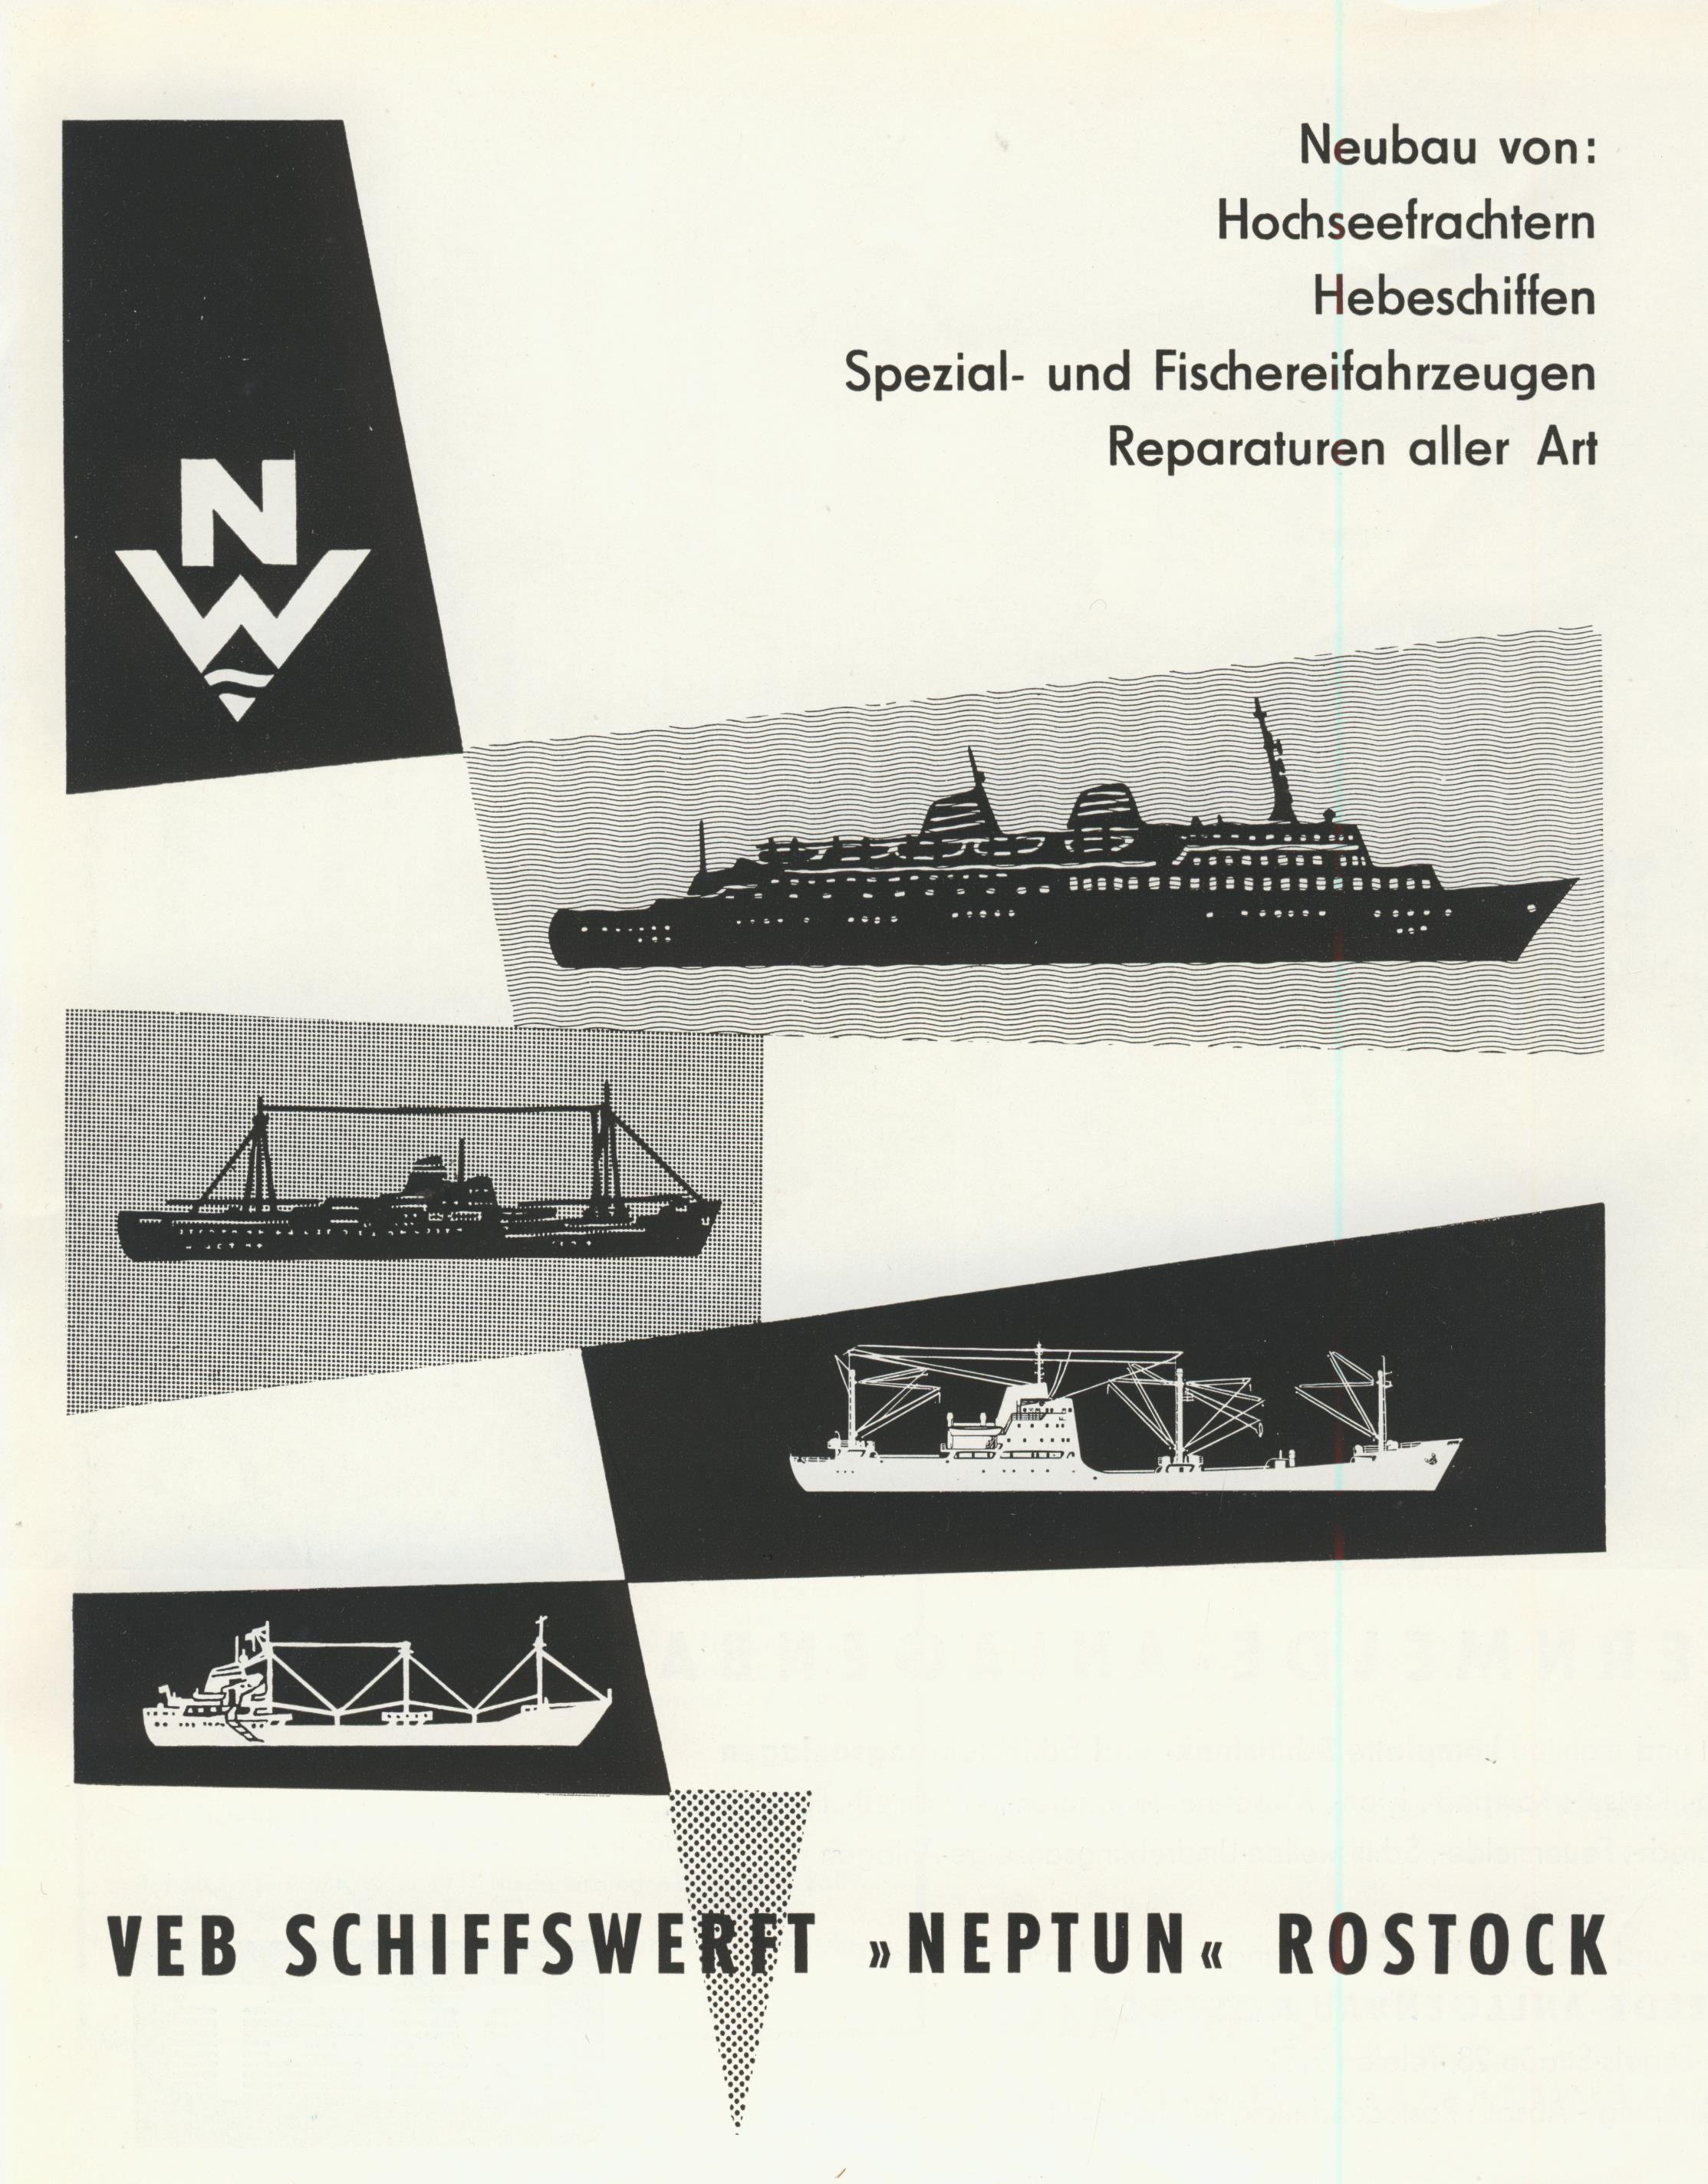 Rostock VEB Schiffswerft Neptun